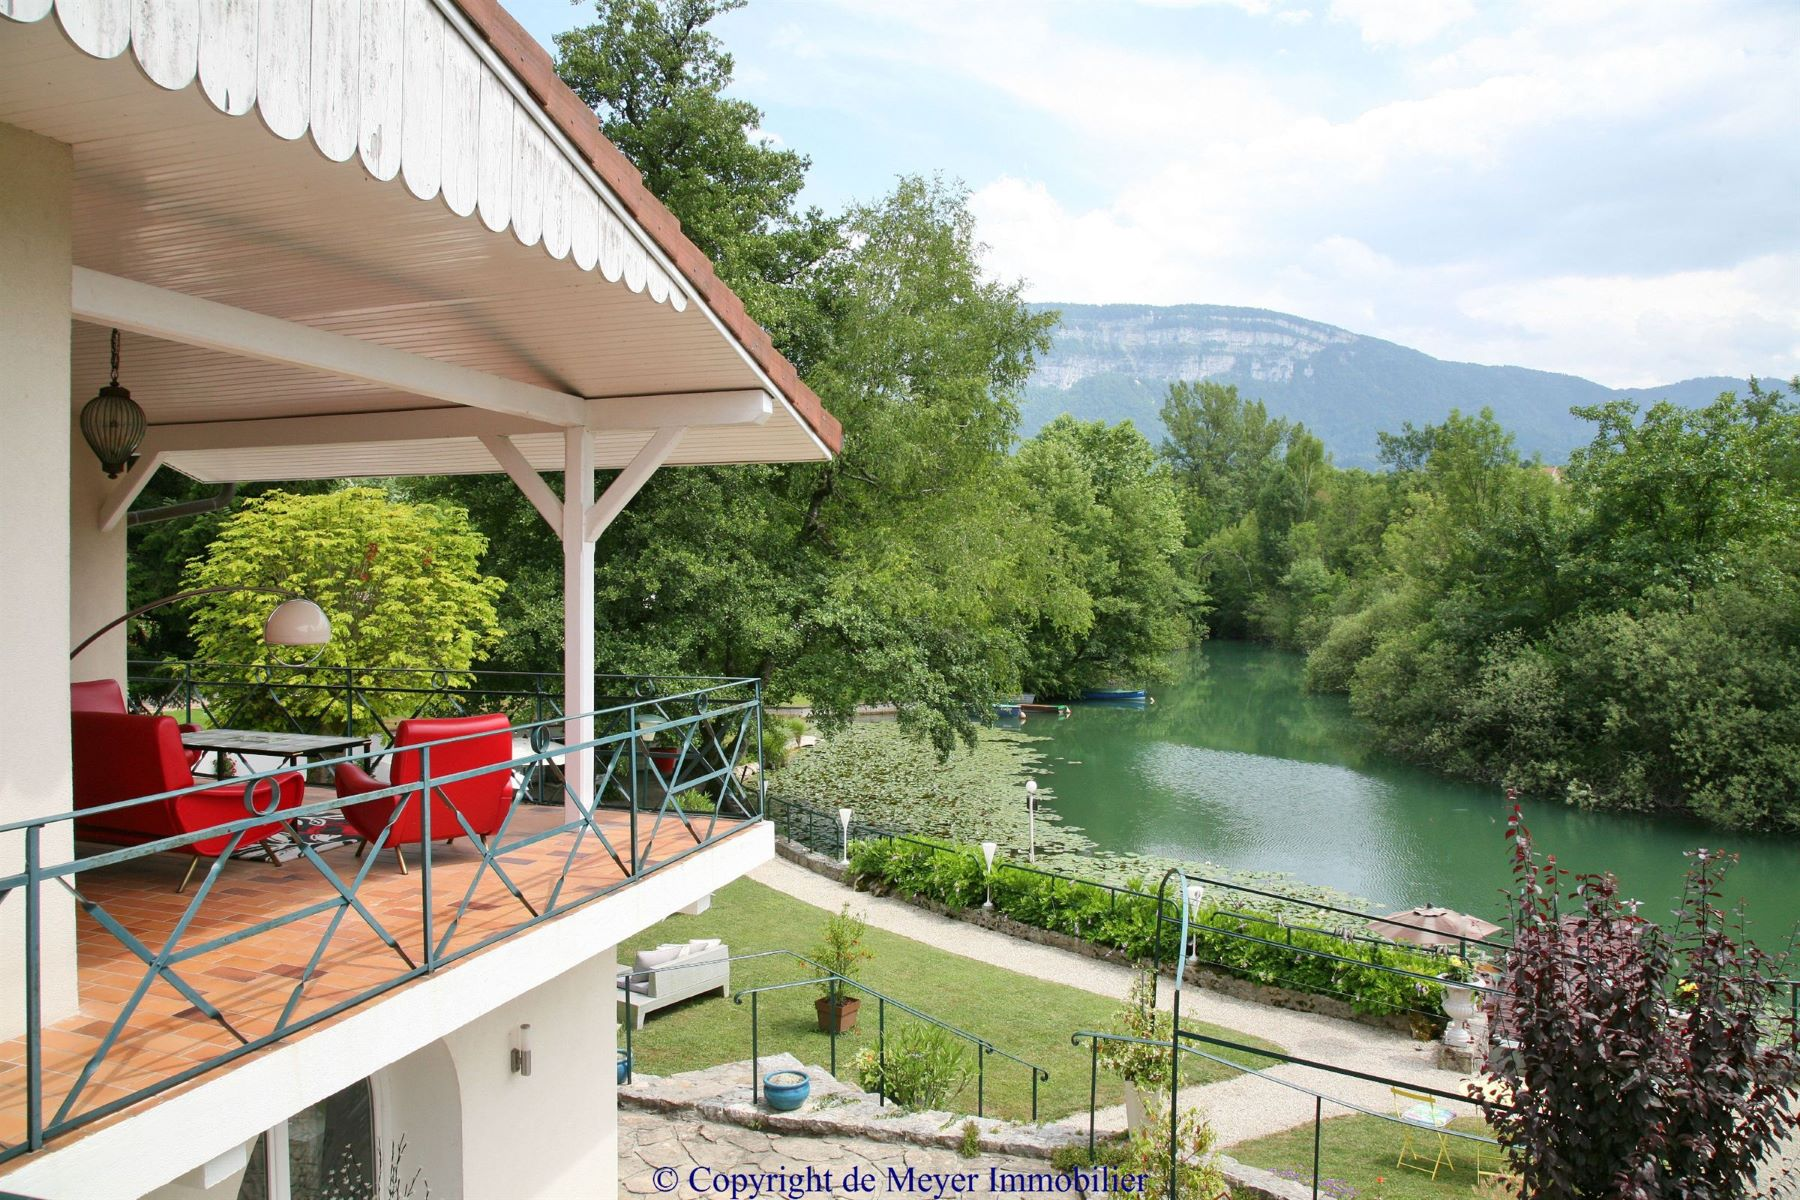 獨棟家庭住宅 為 出售 在 Charming waterfront property Other Rhone-Alpes, Rhone-Alpes, 73610 法國